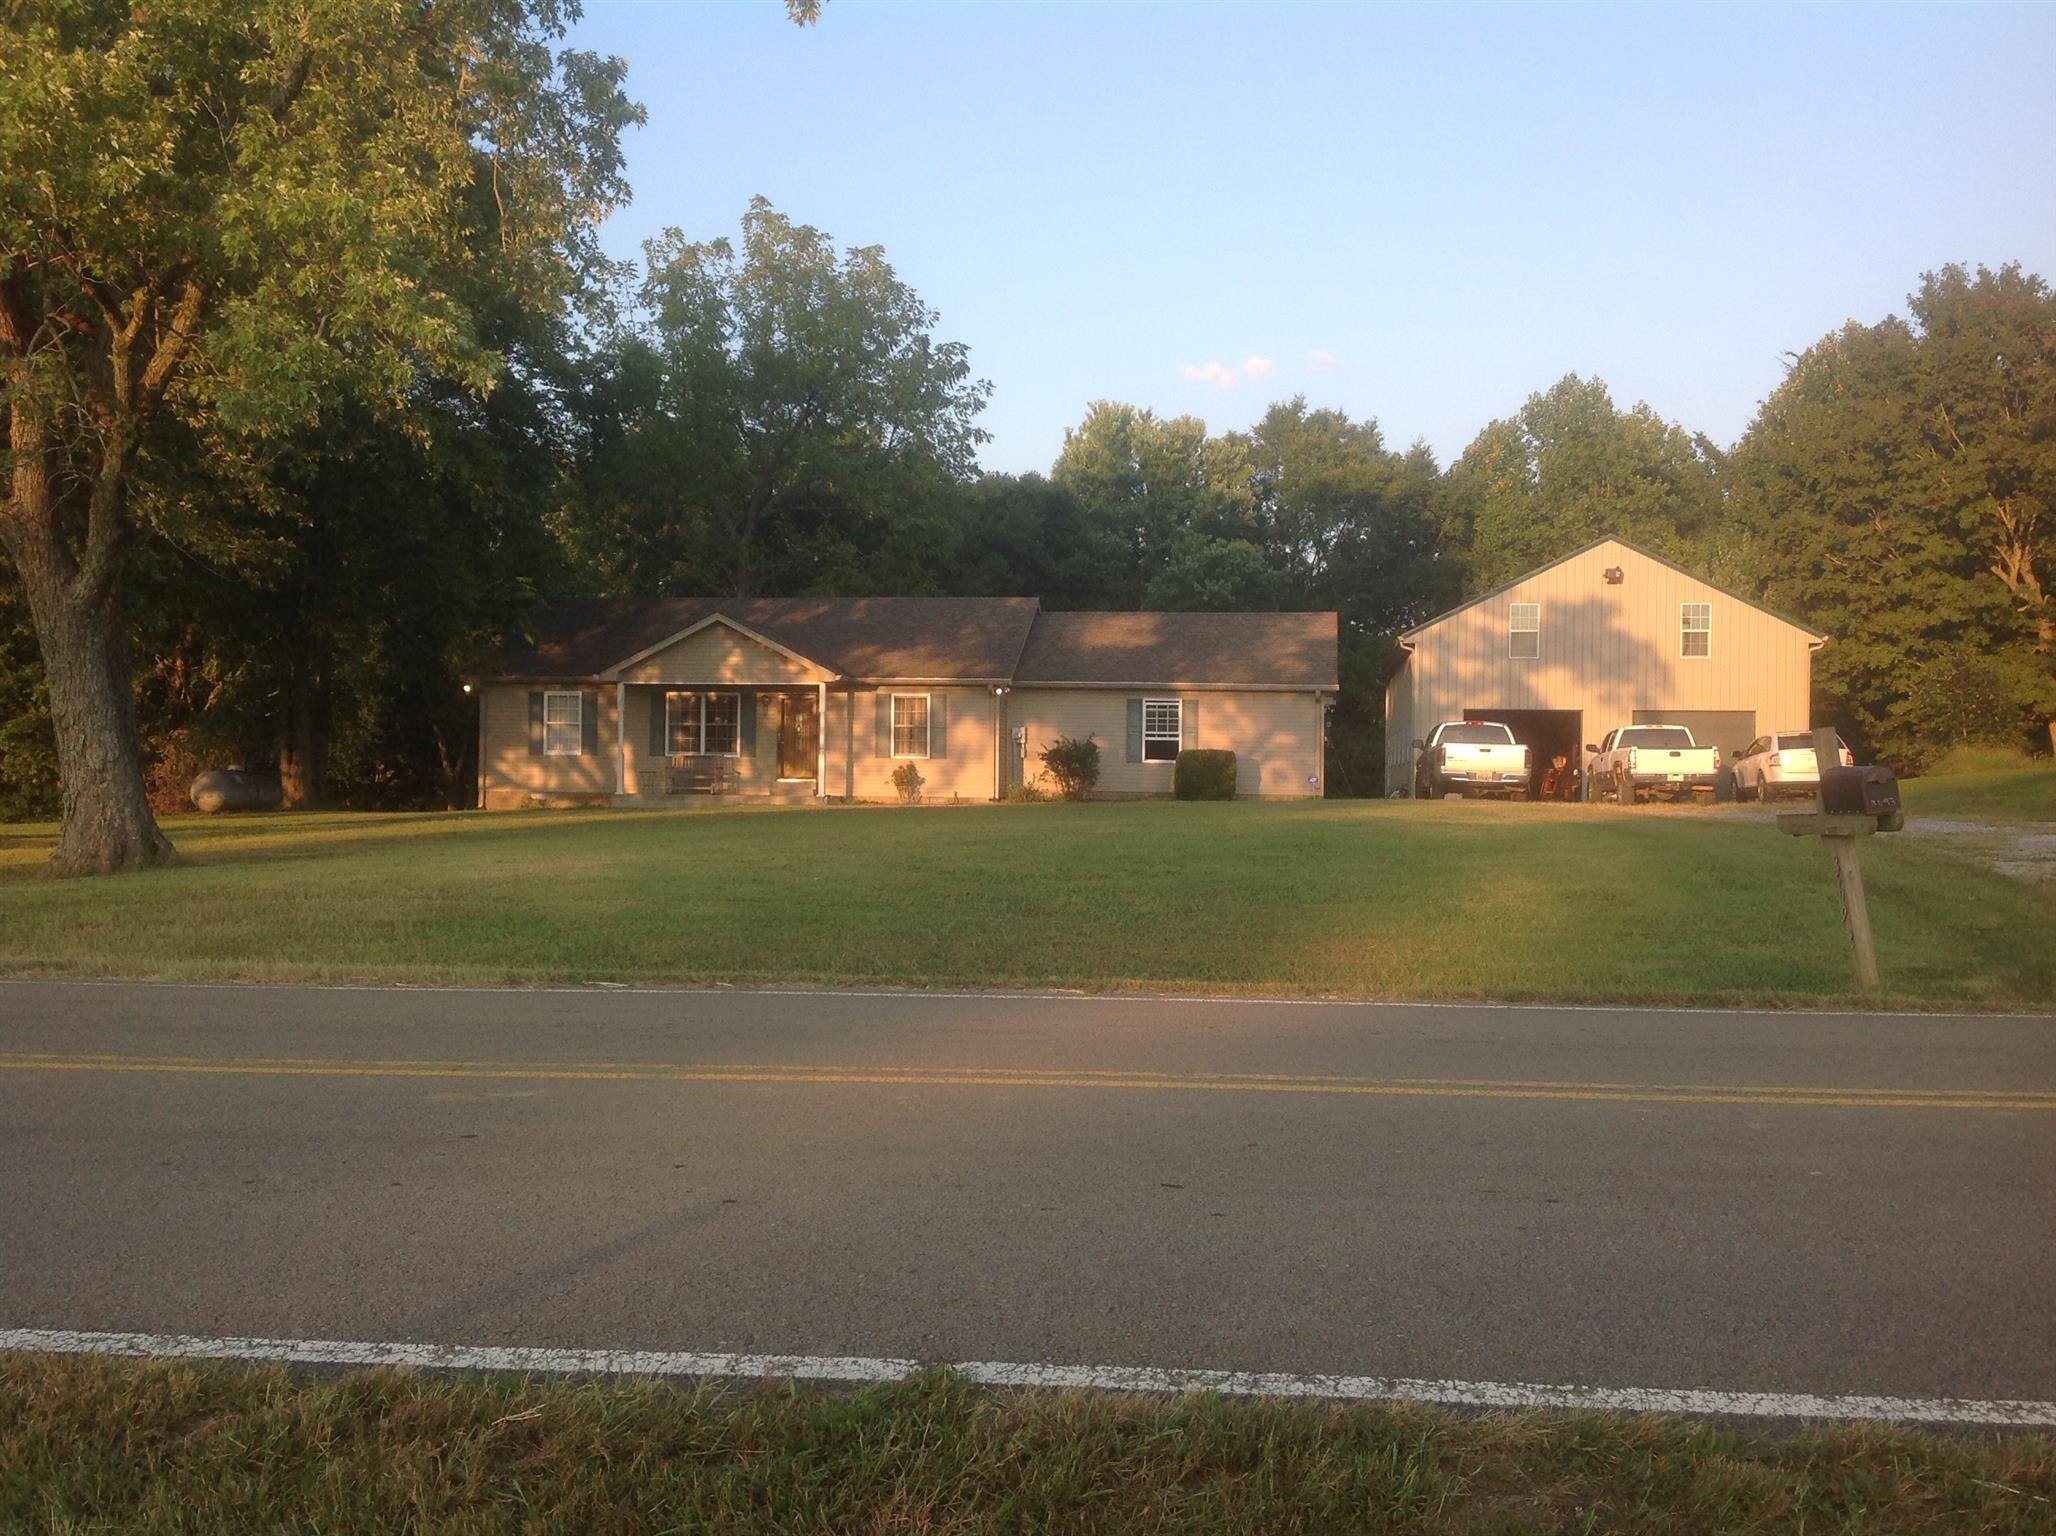 $240,000 - 3Br/2Ba -  for Sale in Na, Cedar Hill